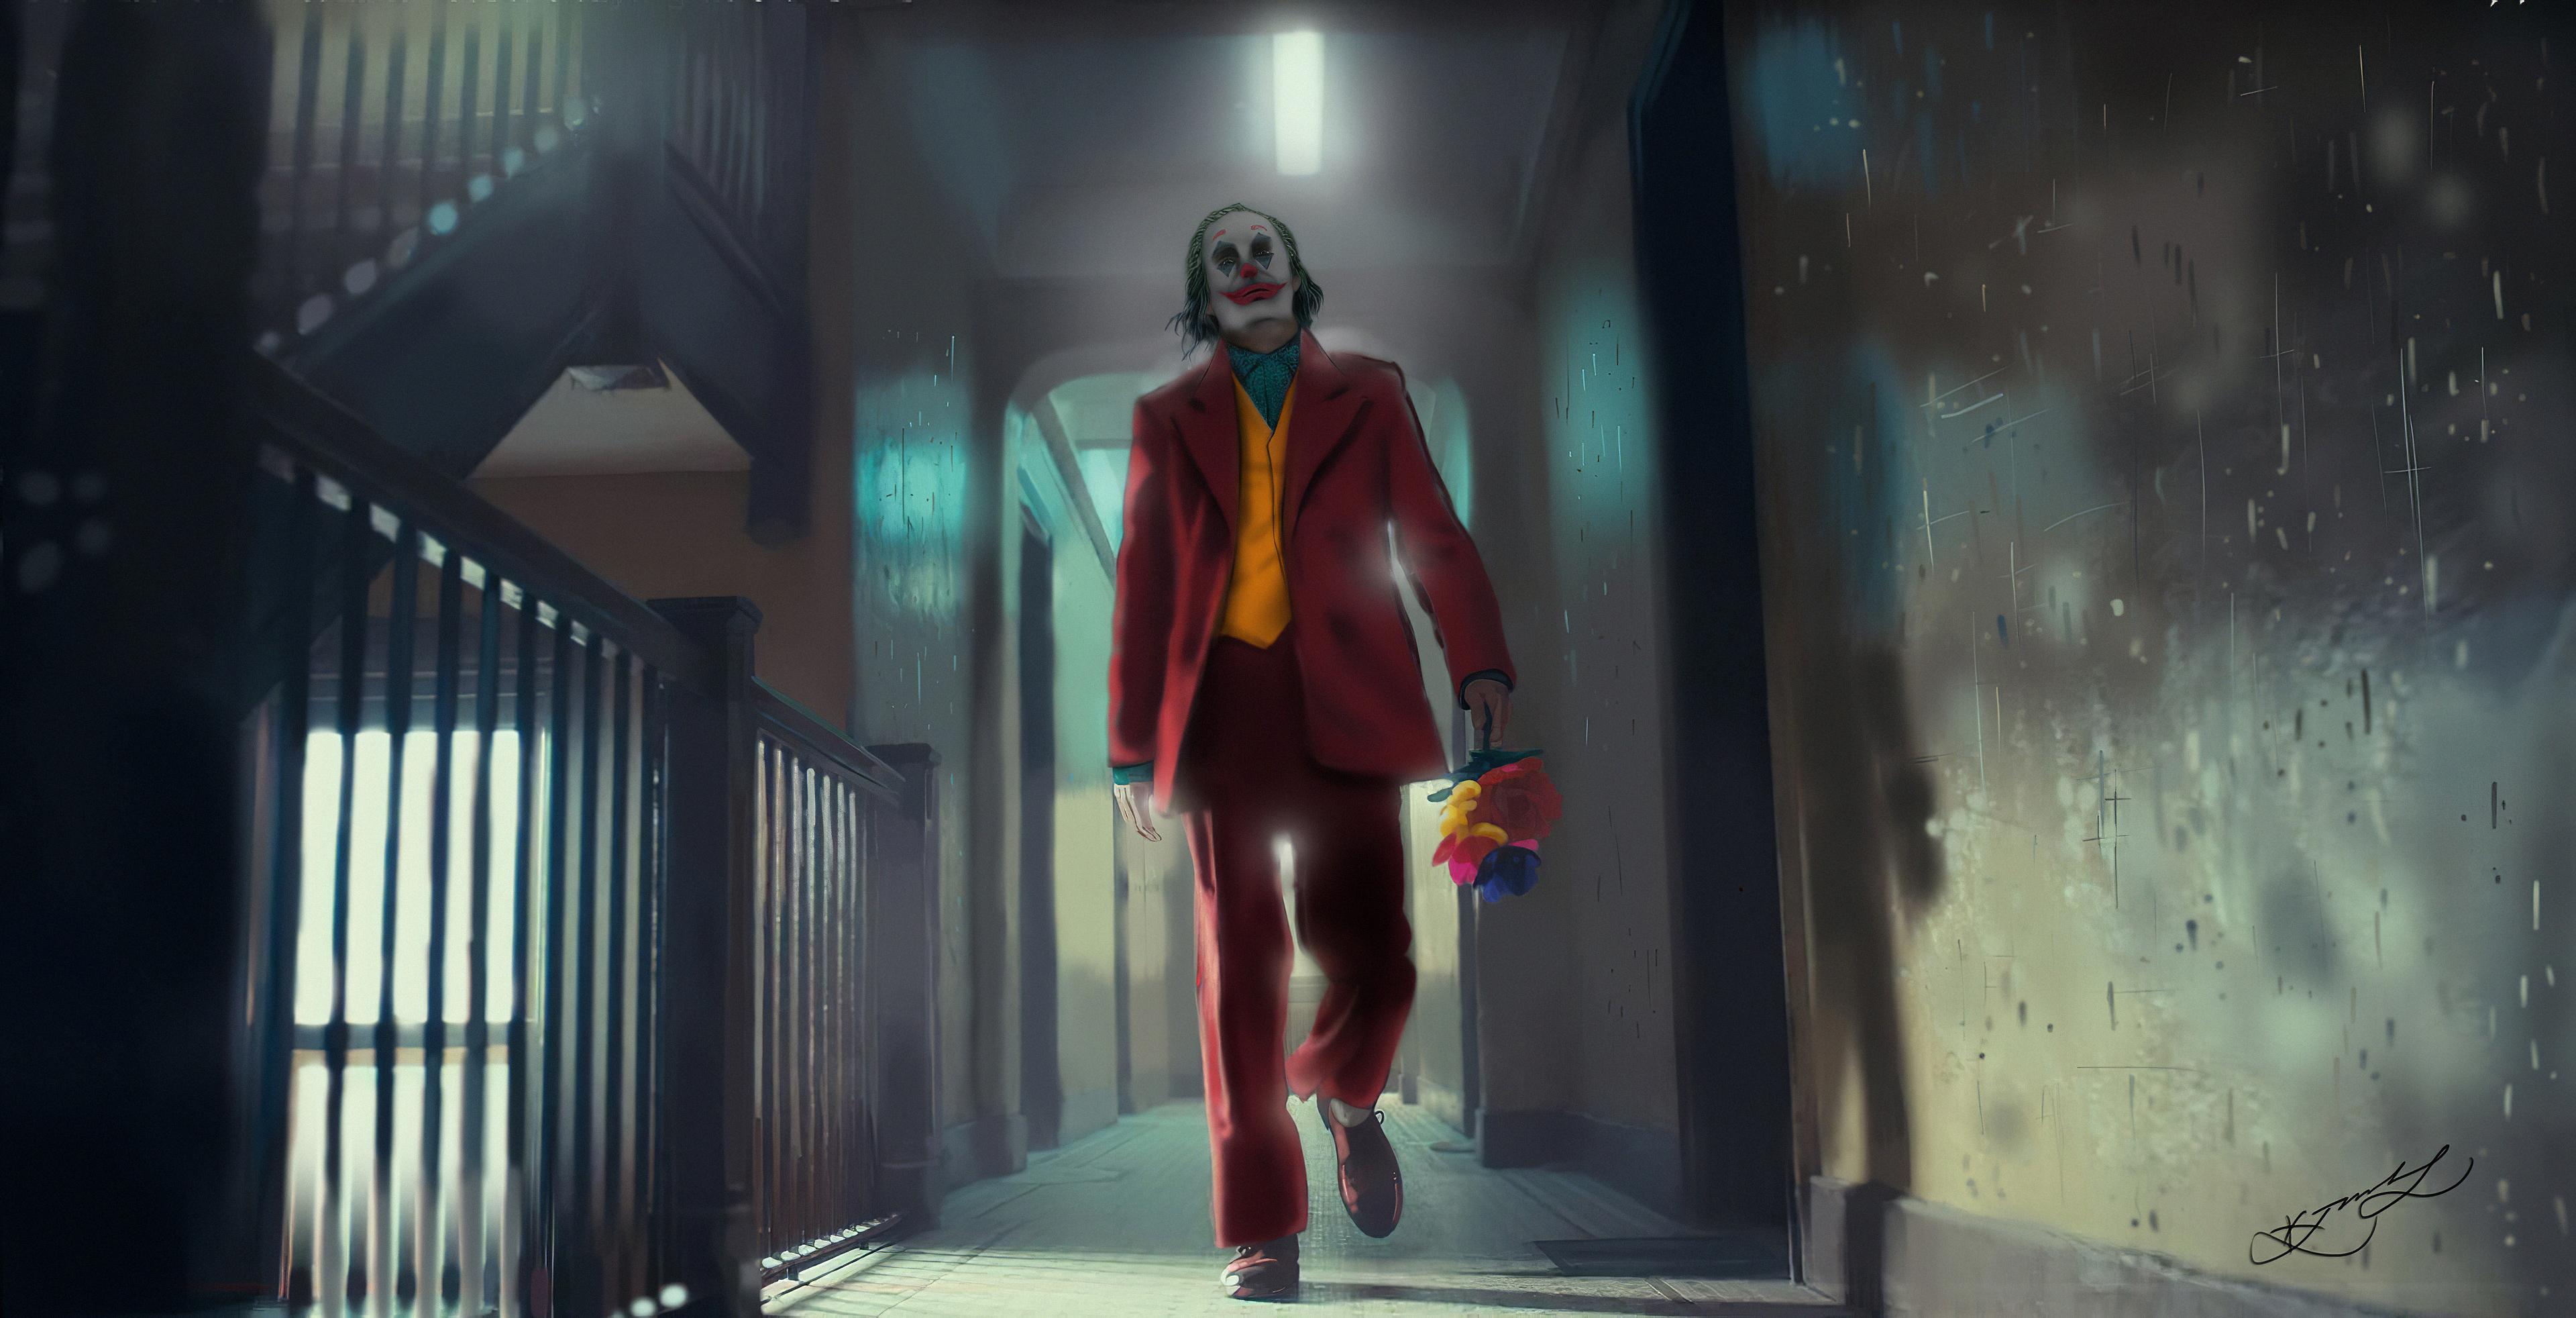 joker walk art 1576096920 - Joker Walk Art - Joker wallpaper 4k hd, joker phone wallpaper hd 4k, joker hd wallpaper 4k, joker art wallpaper hd 4k, 4k wallpaper joker